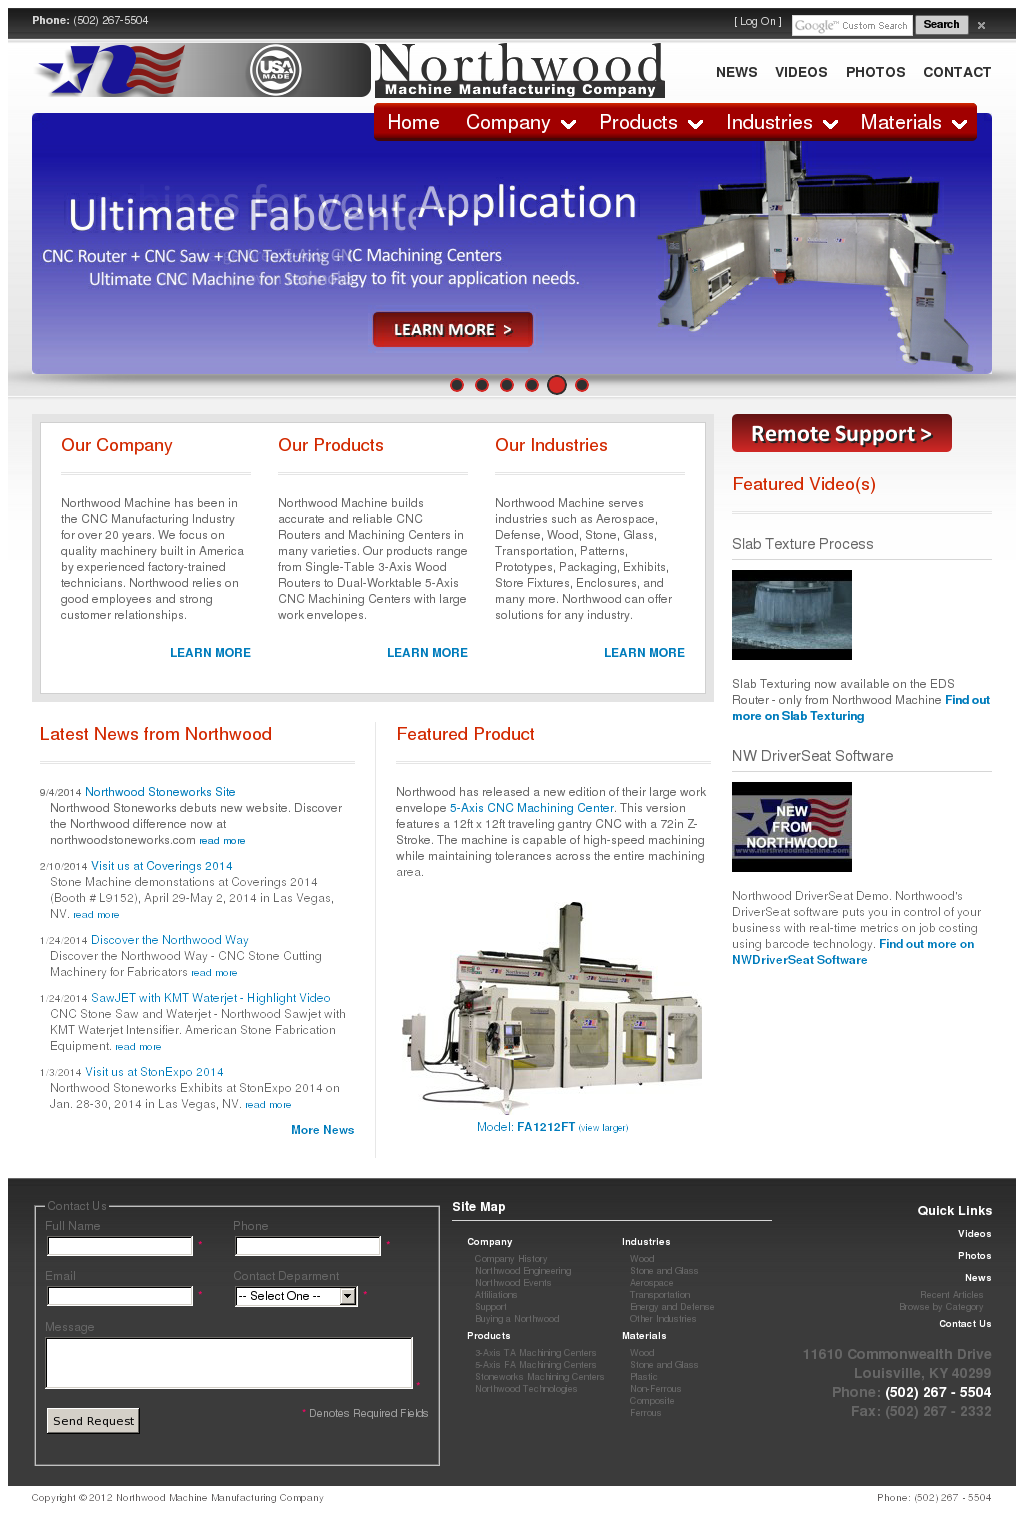 Northwood Machine Manufacturing Company Competitors, Revenue